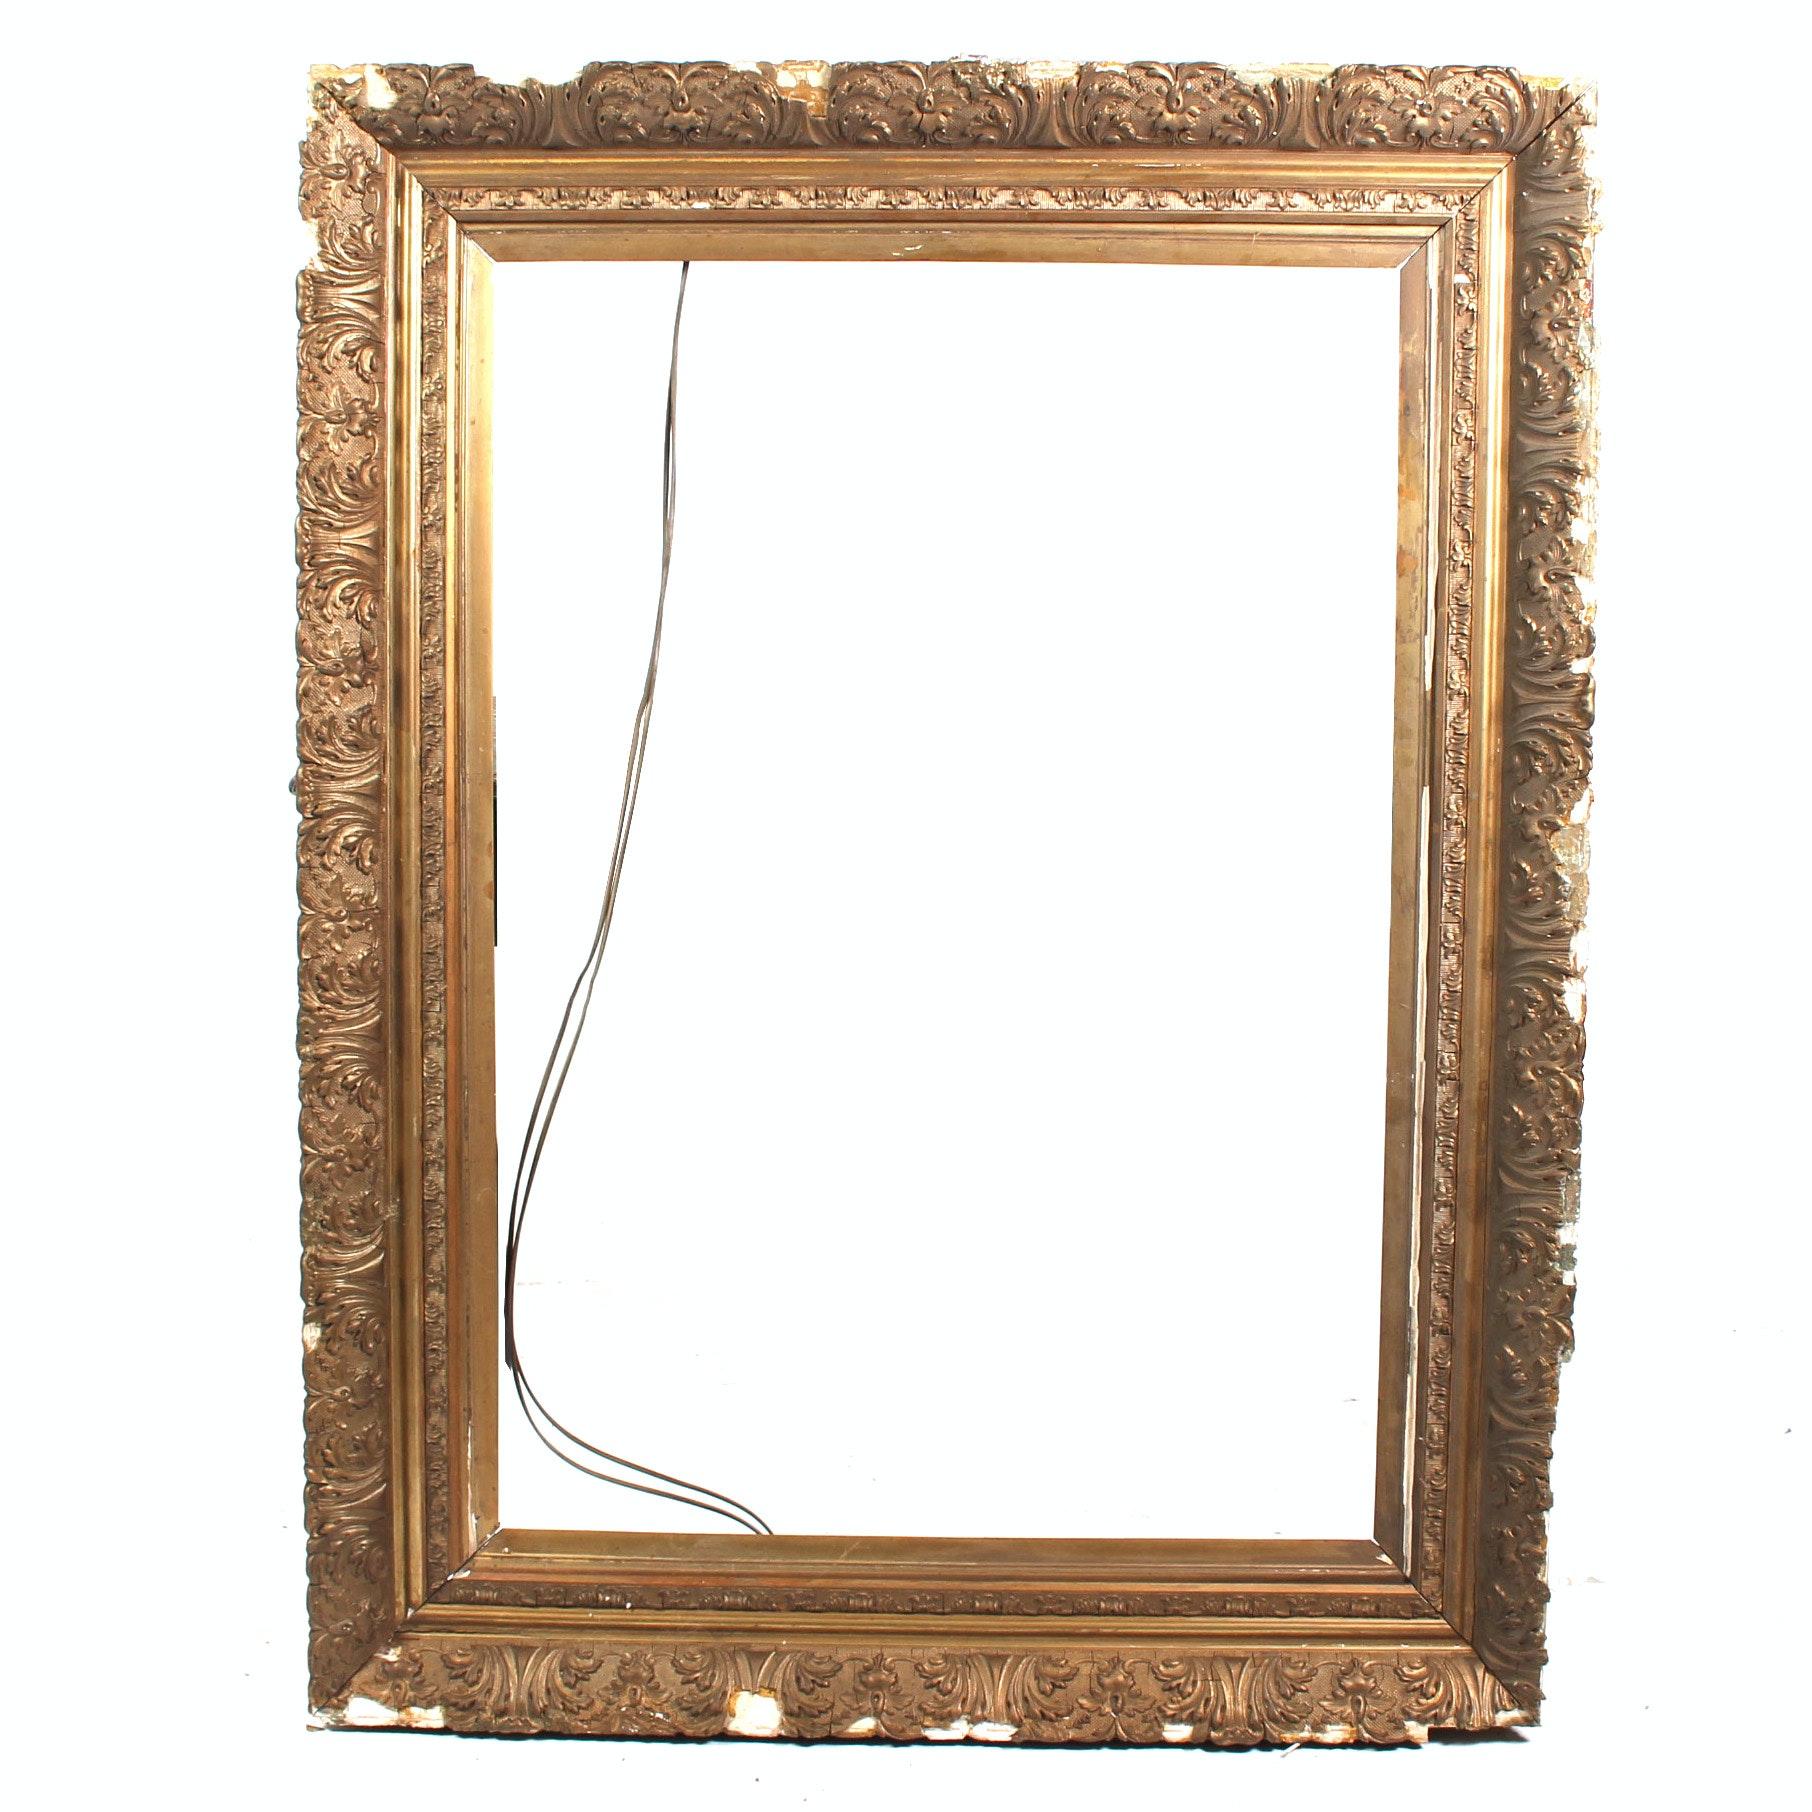 Ornate Gold Tone Frame